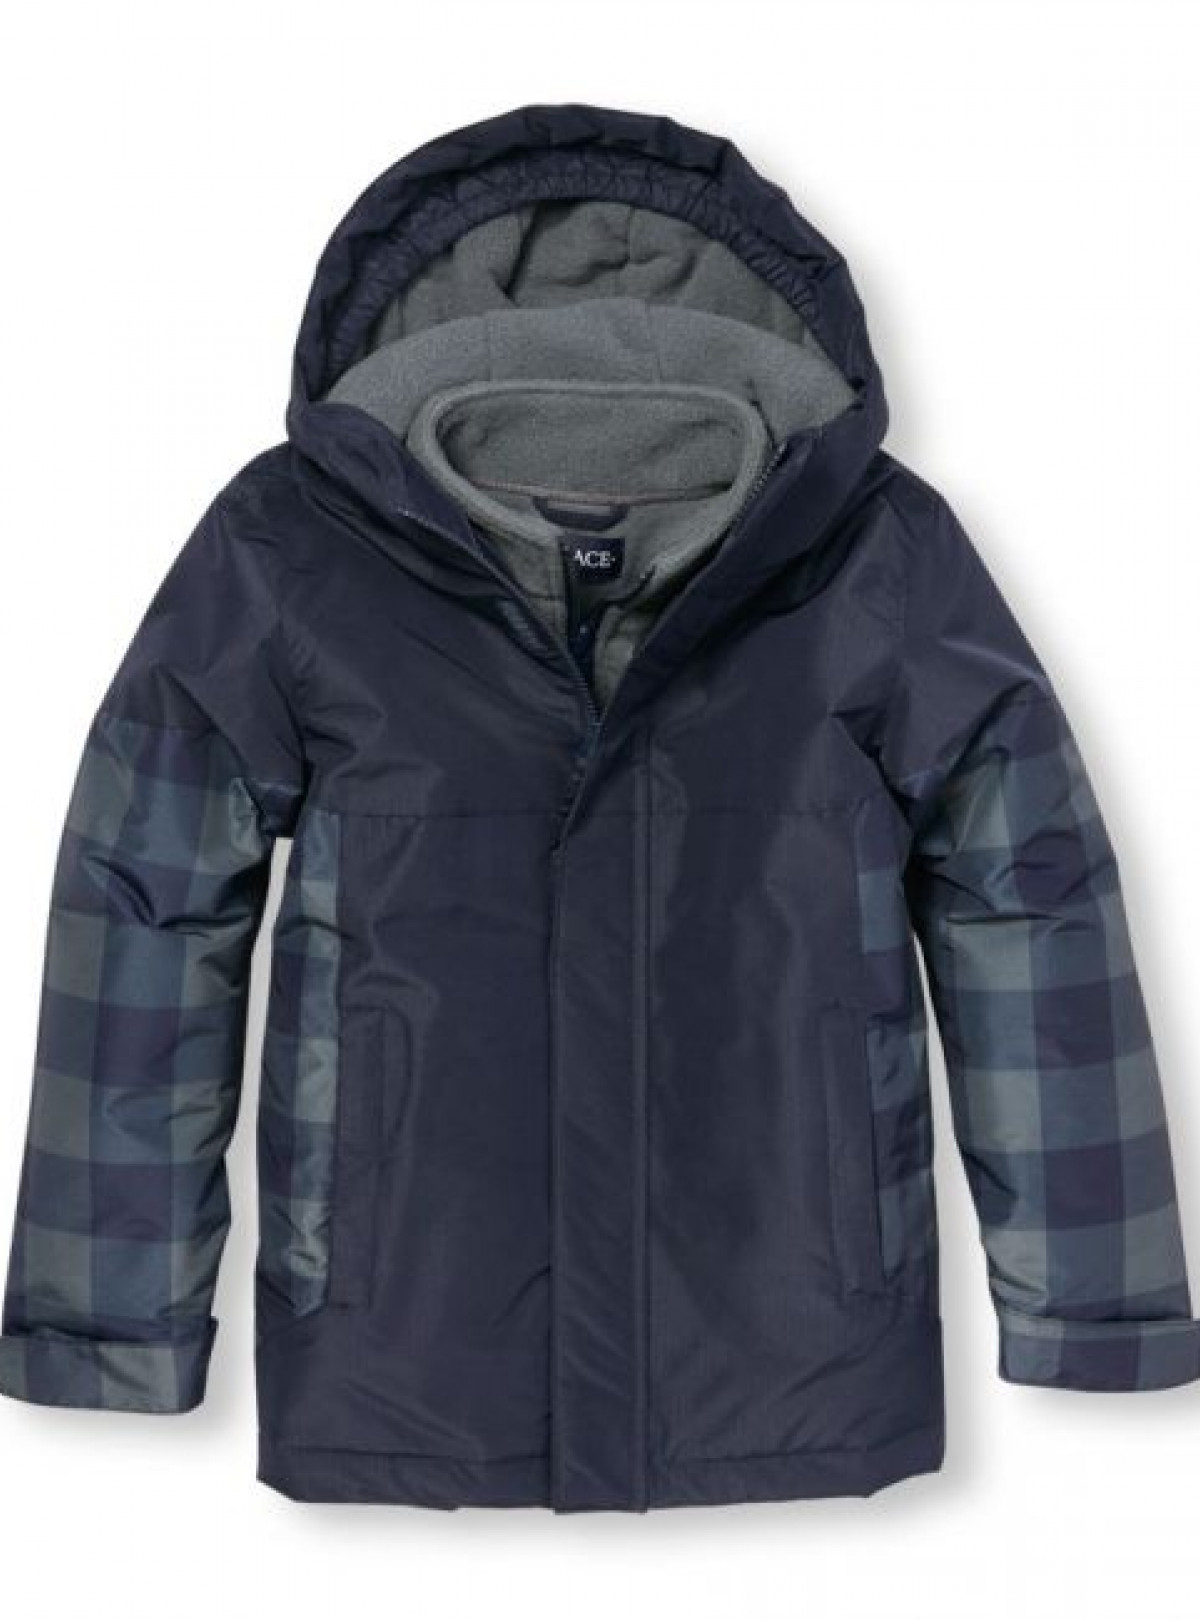 Куртка зимняя 3 в 1  The Children's Place синяя   896